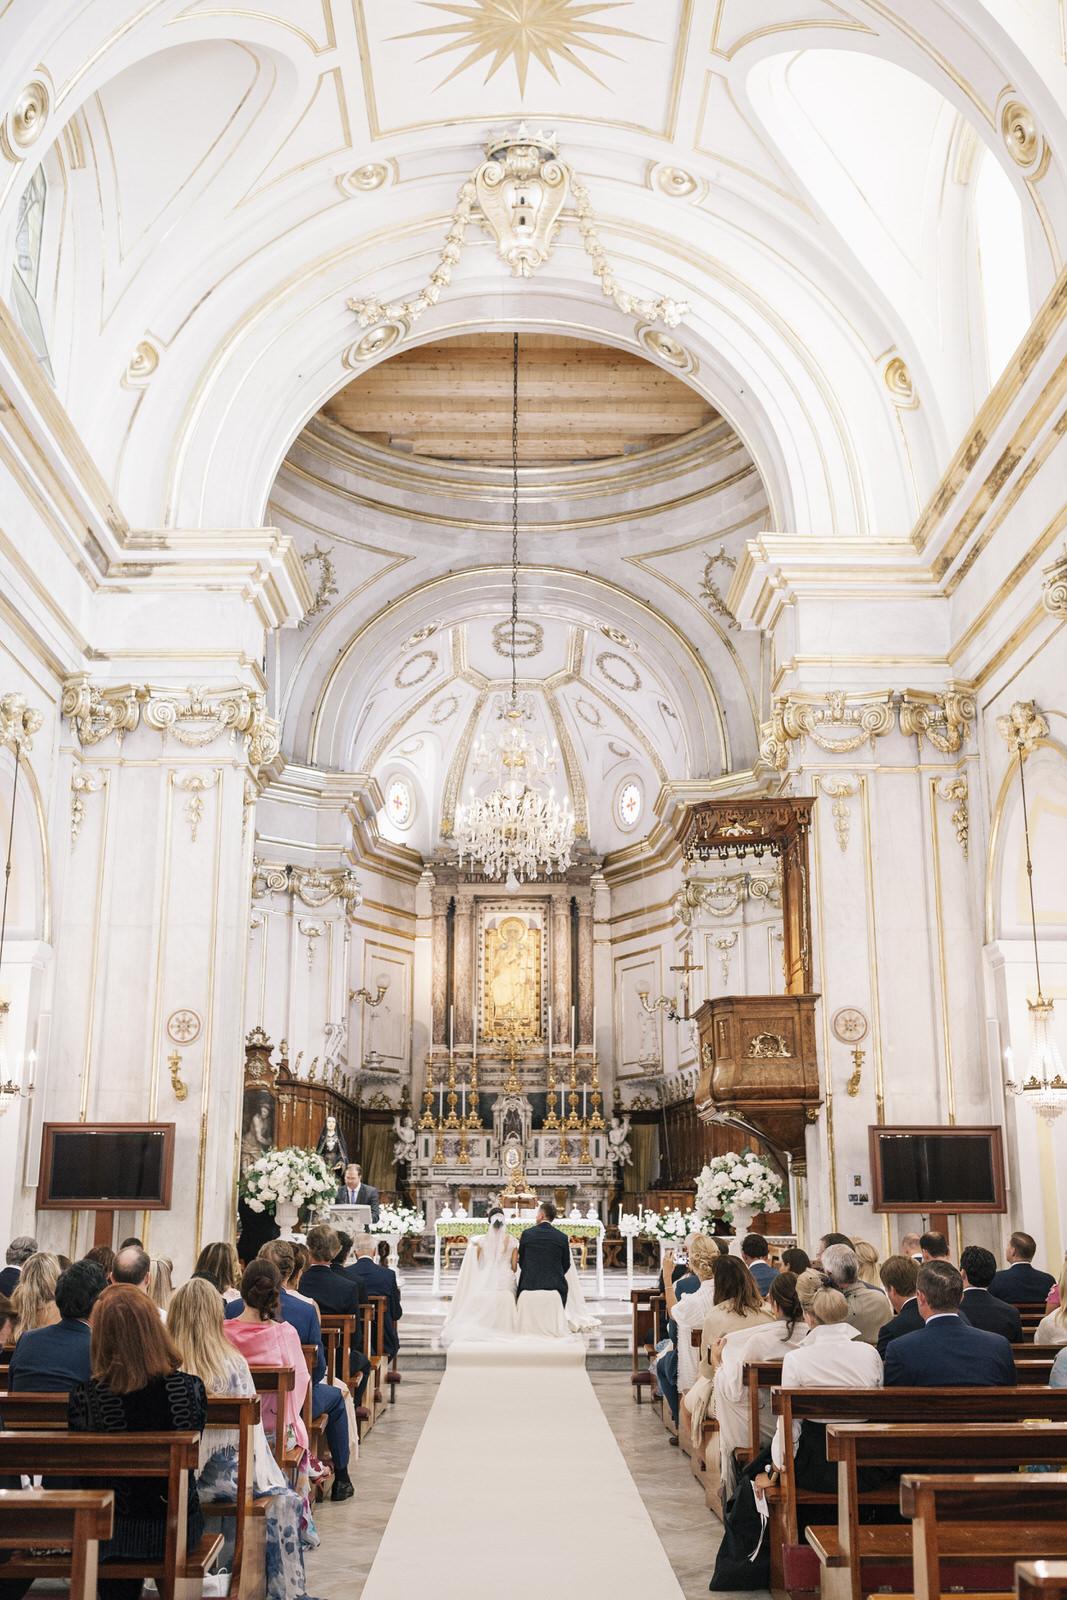 Interior of Positano cathedral